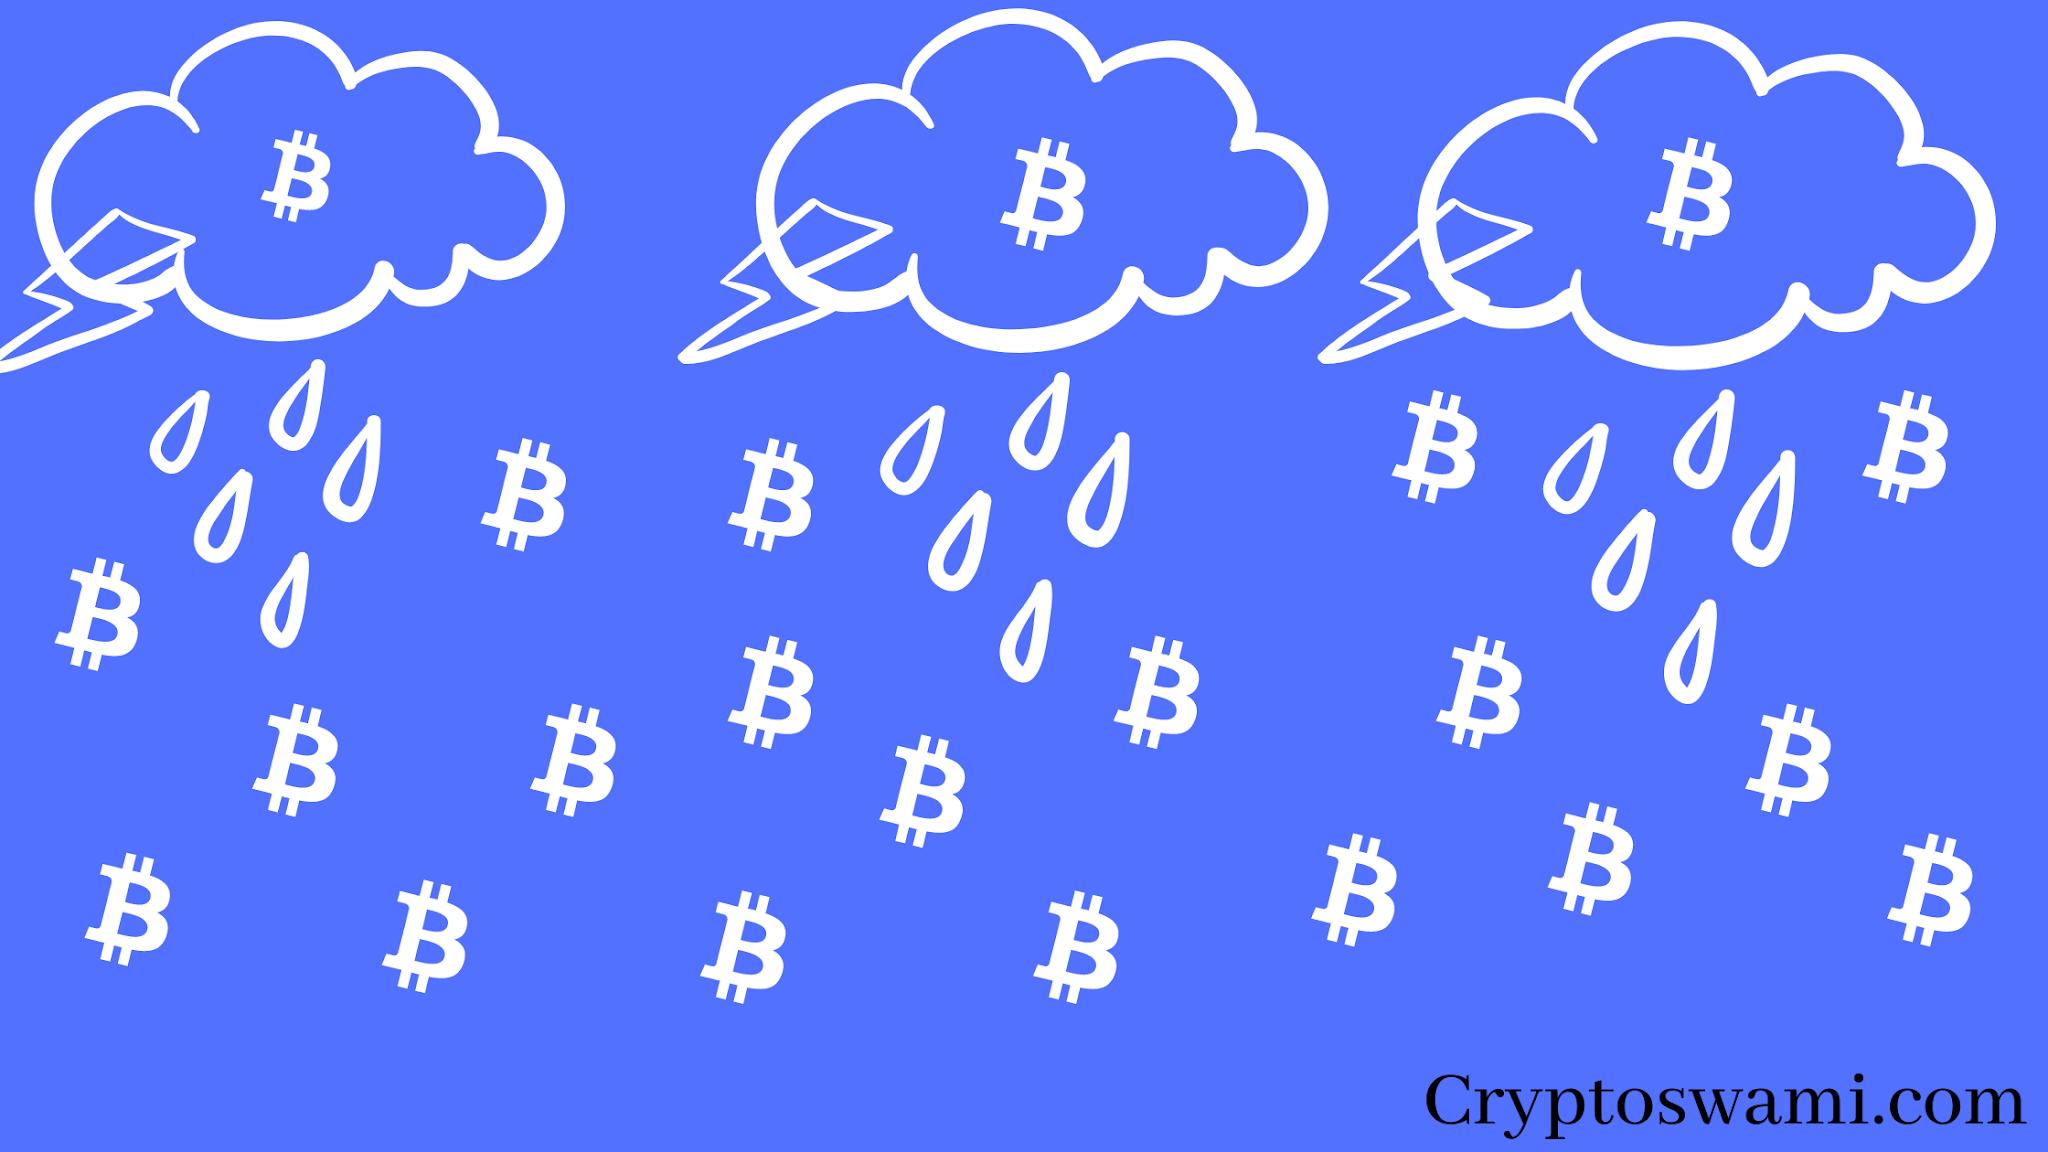 Free BTC - 22 Ways To Earn Free Bitcoin